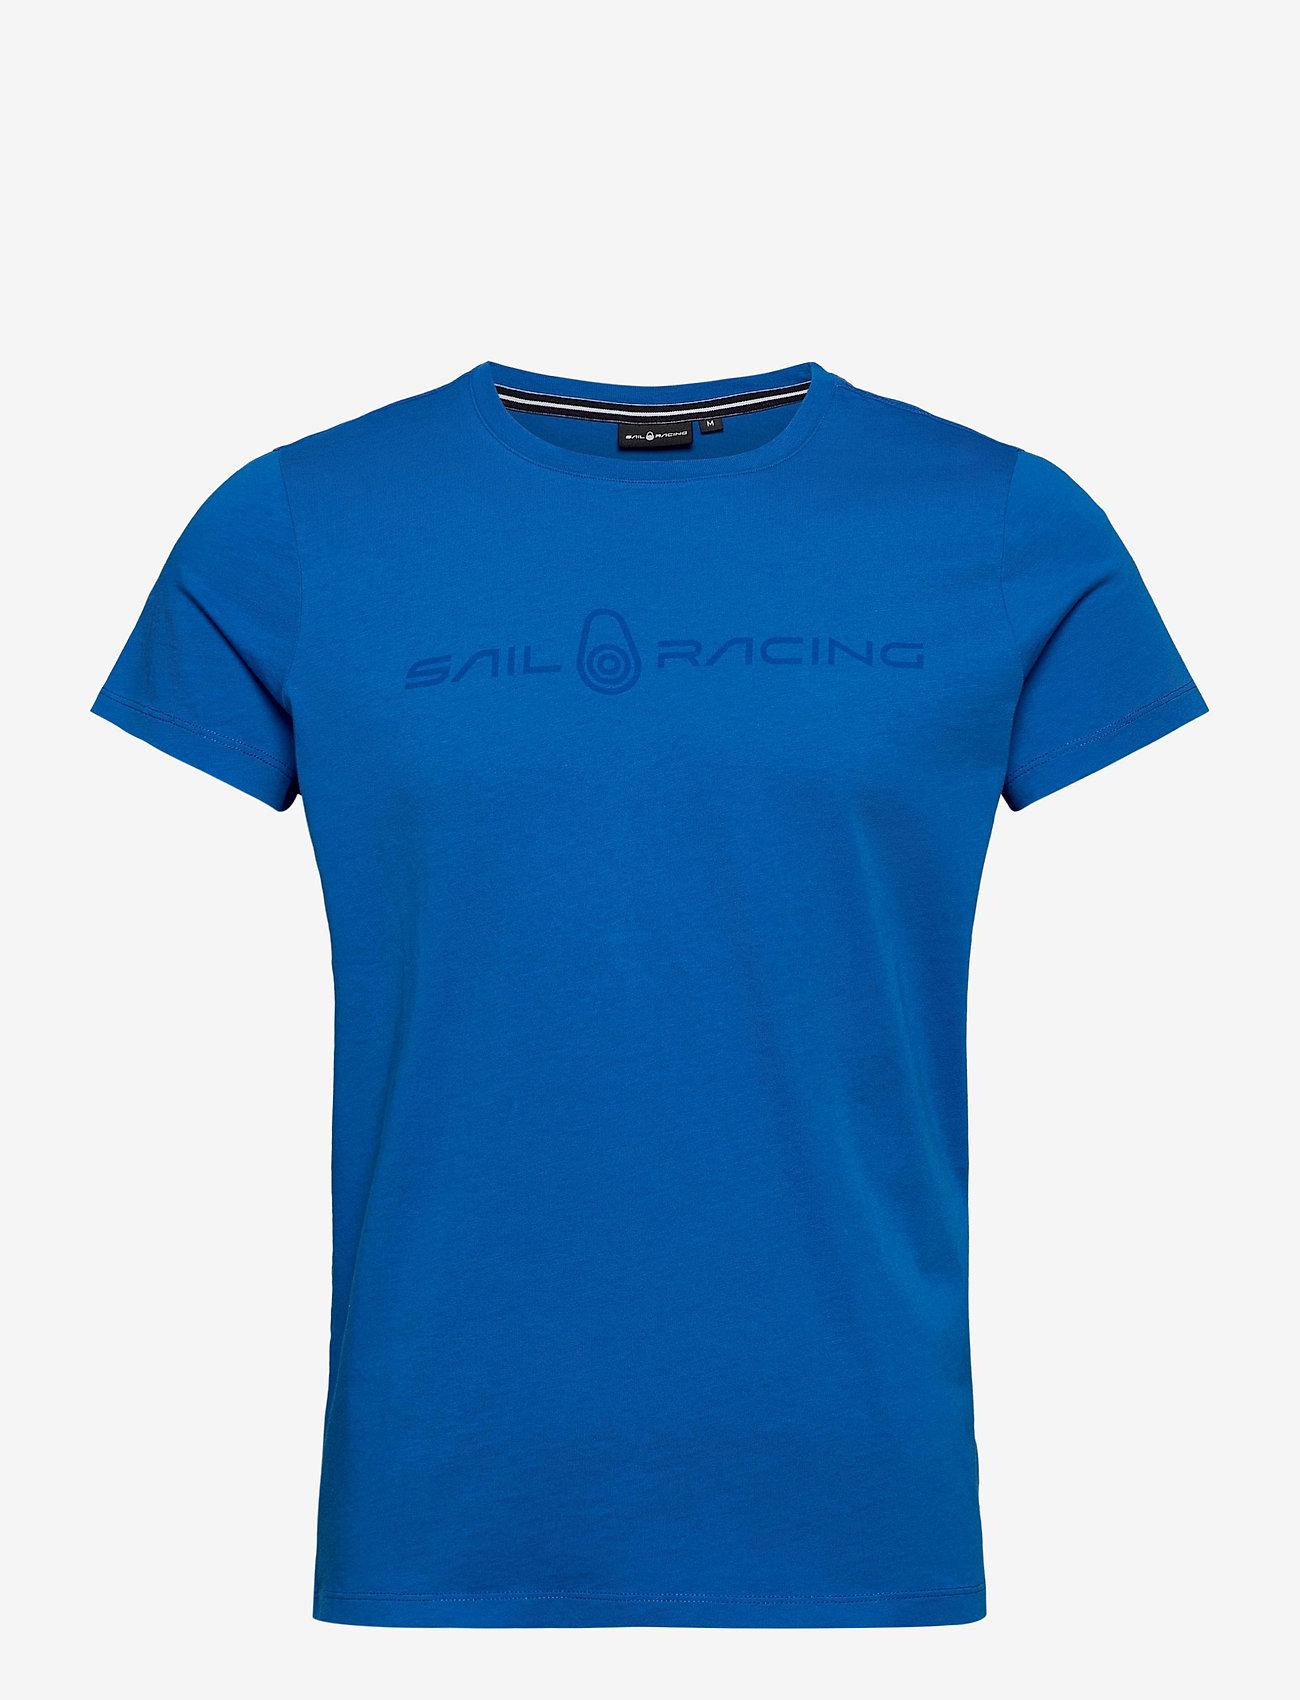 Sail Racing - BOWMAN TEE - sports tops - bright blue - 0